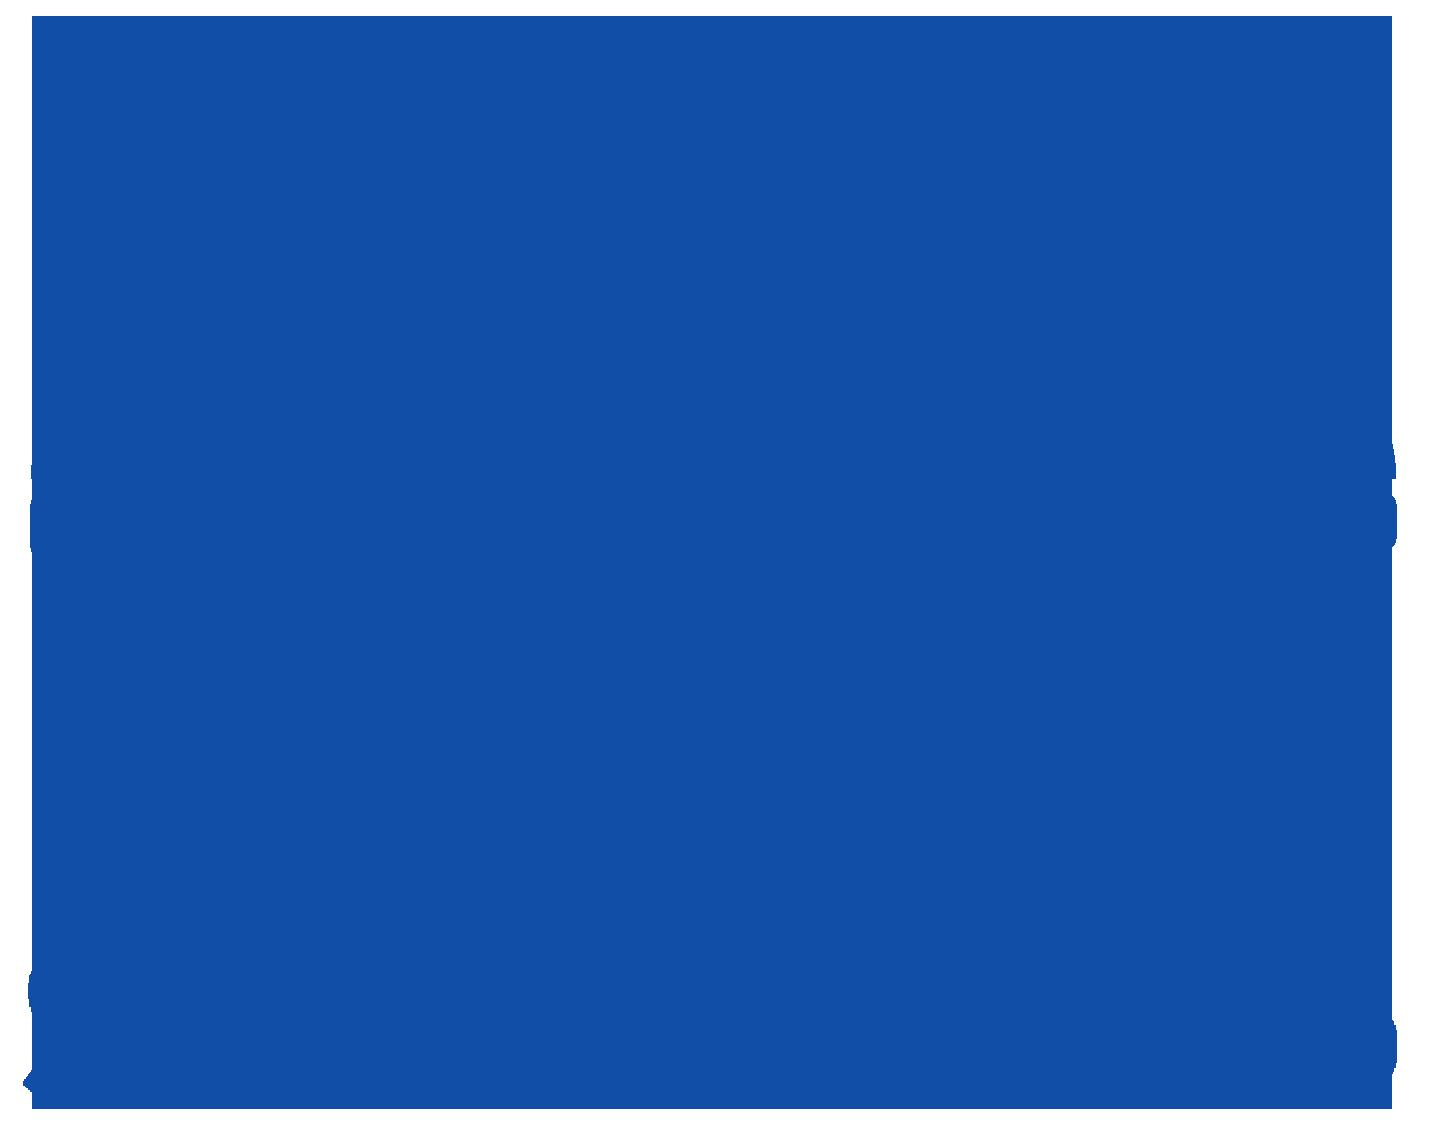 SendBeatsTo Blue Logo, Transparent Background